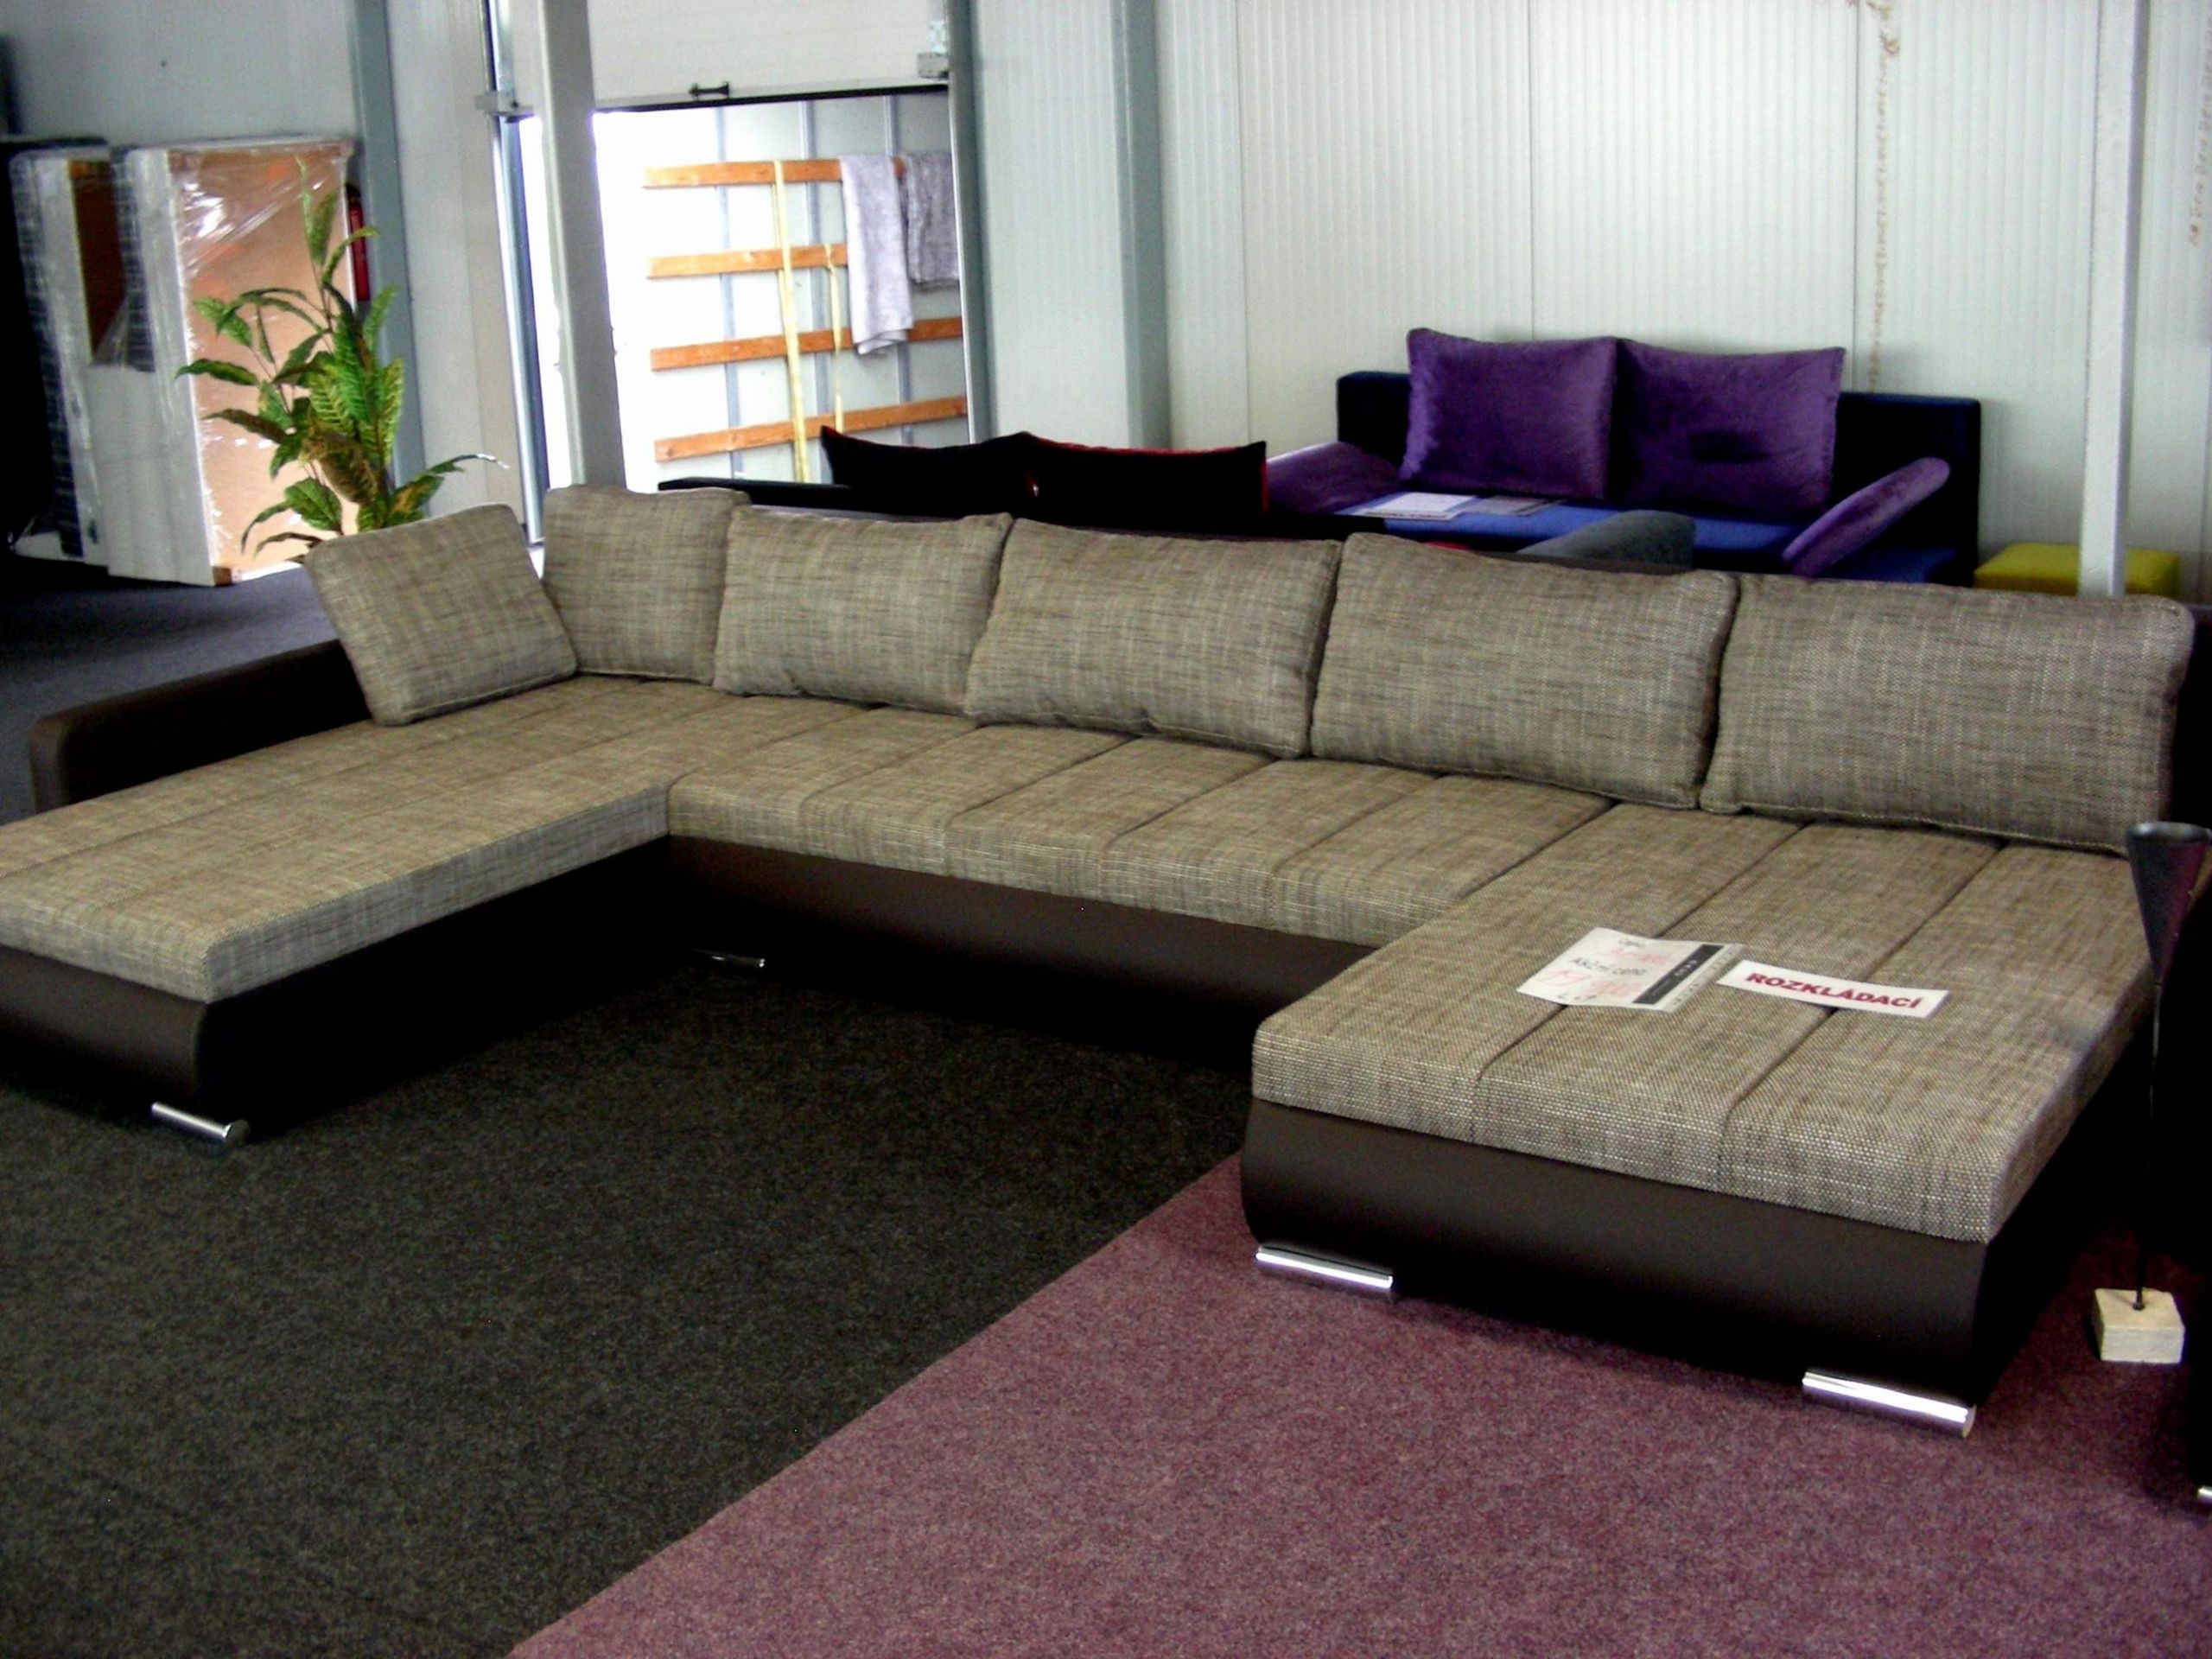 Full Size of Hussen Sofa Stoff Grau Mit Led Polyrattan Lila Megapol Cognac Kare Freistil Weiß Sofa Luxus Sofa